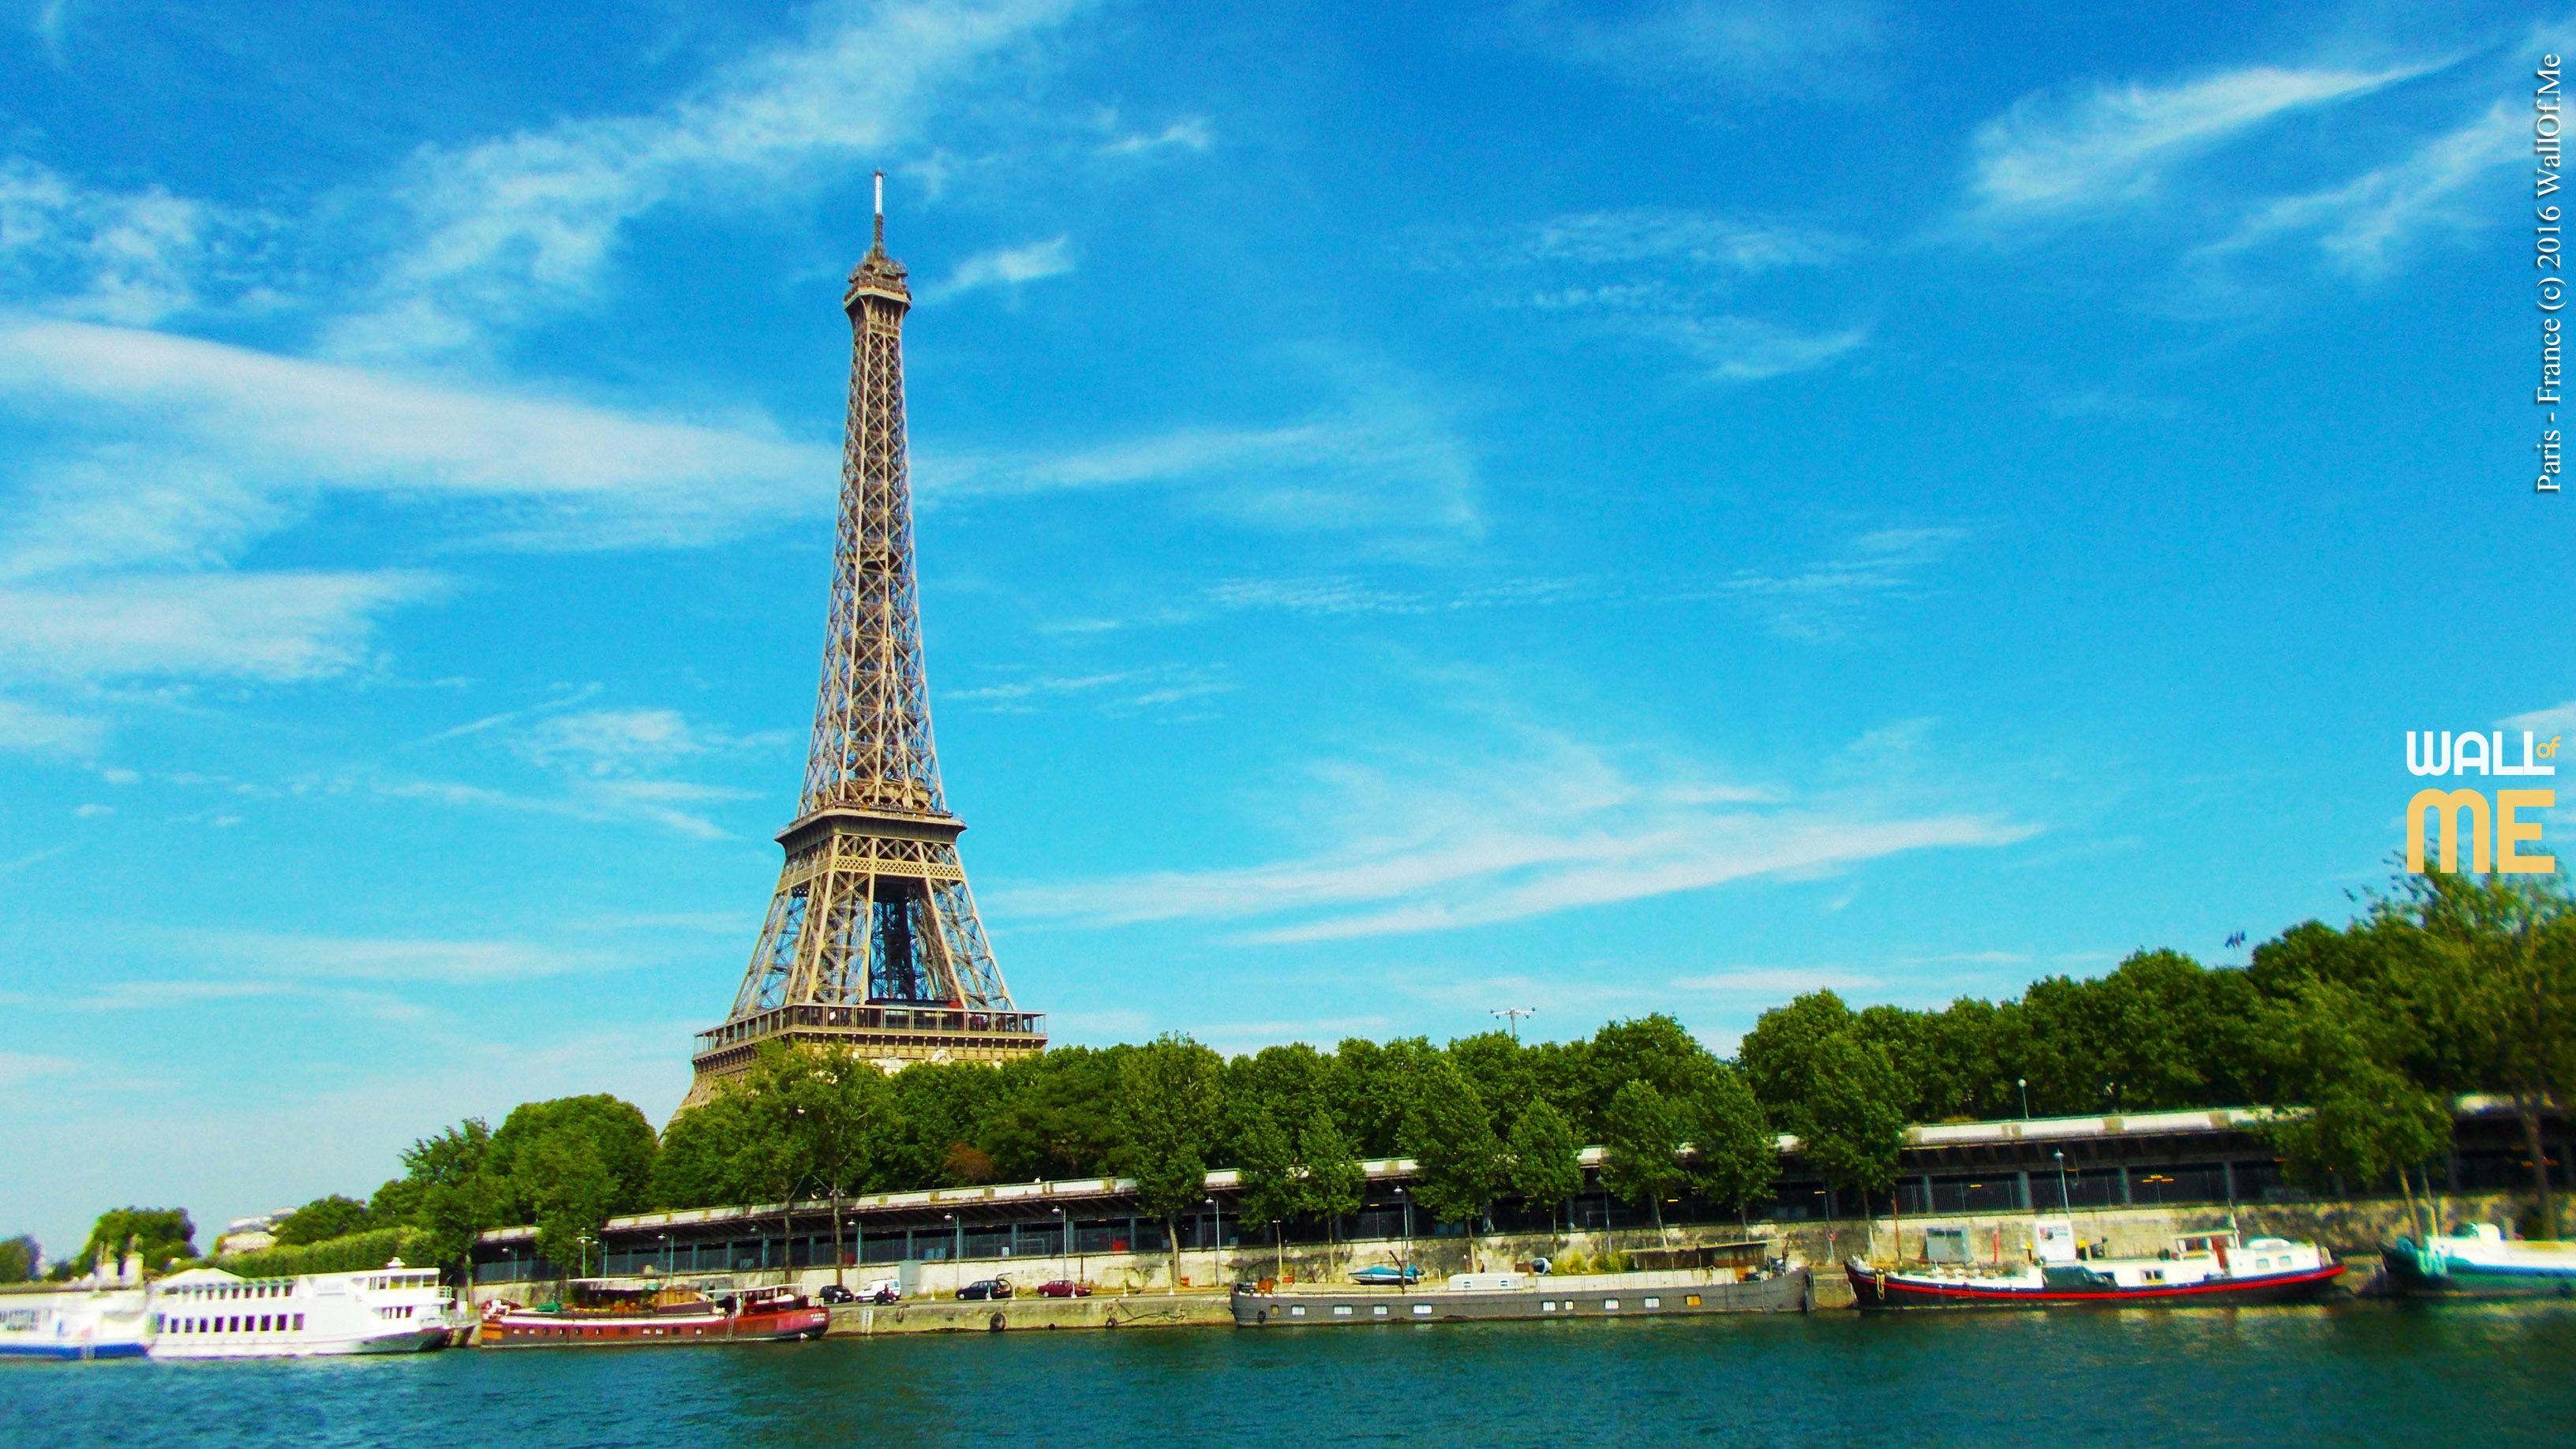 2016, week 25. Tour Eiffel, Paris - France. Picture taken: 2015, 06